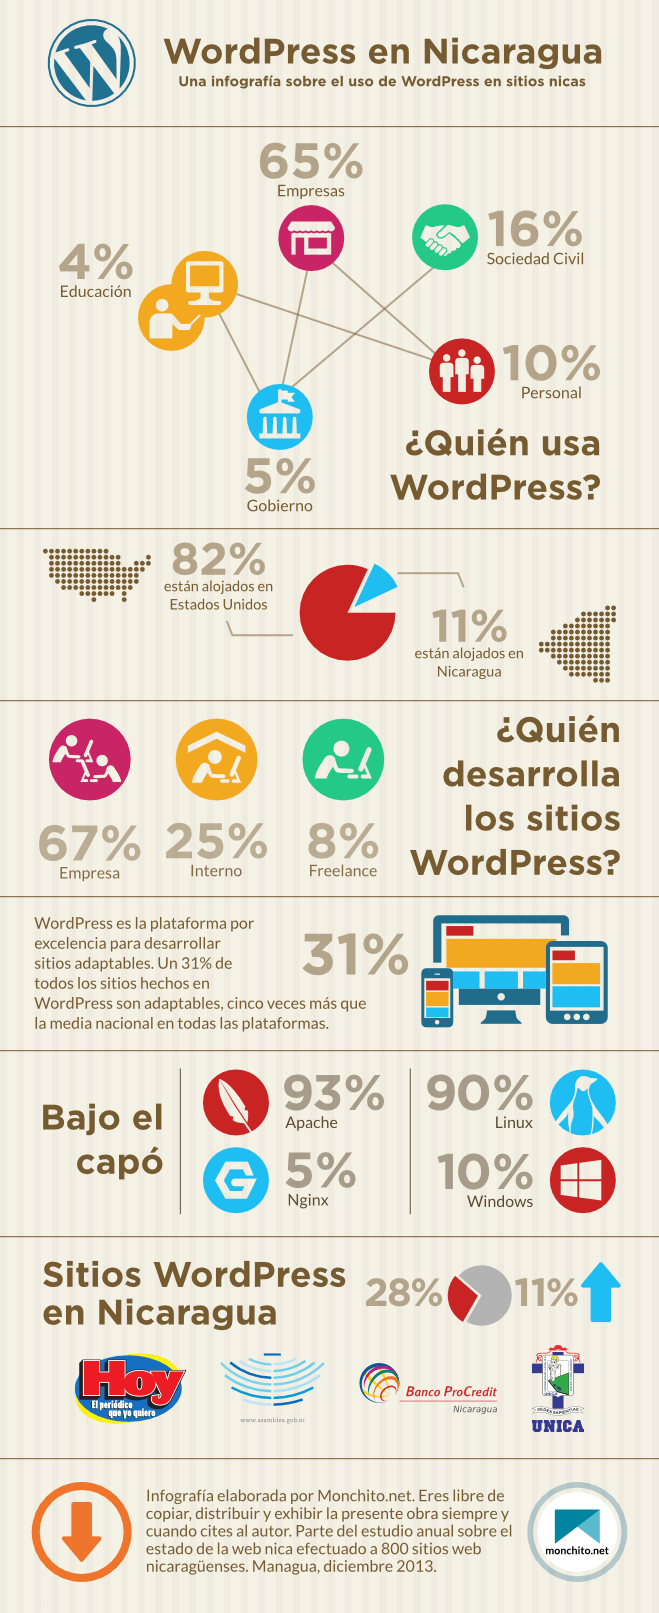 Uso de WordPress en Nicaragua | Monchito.net